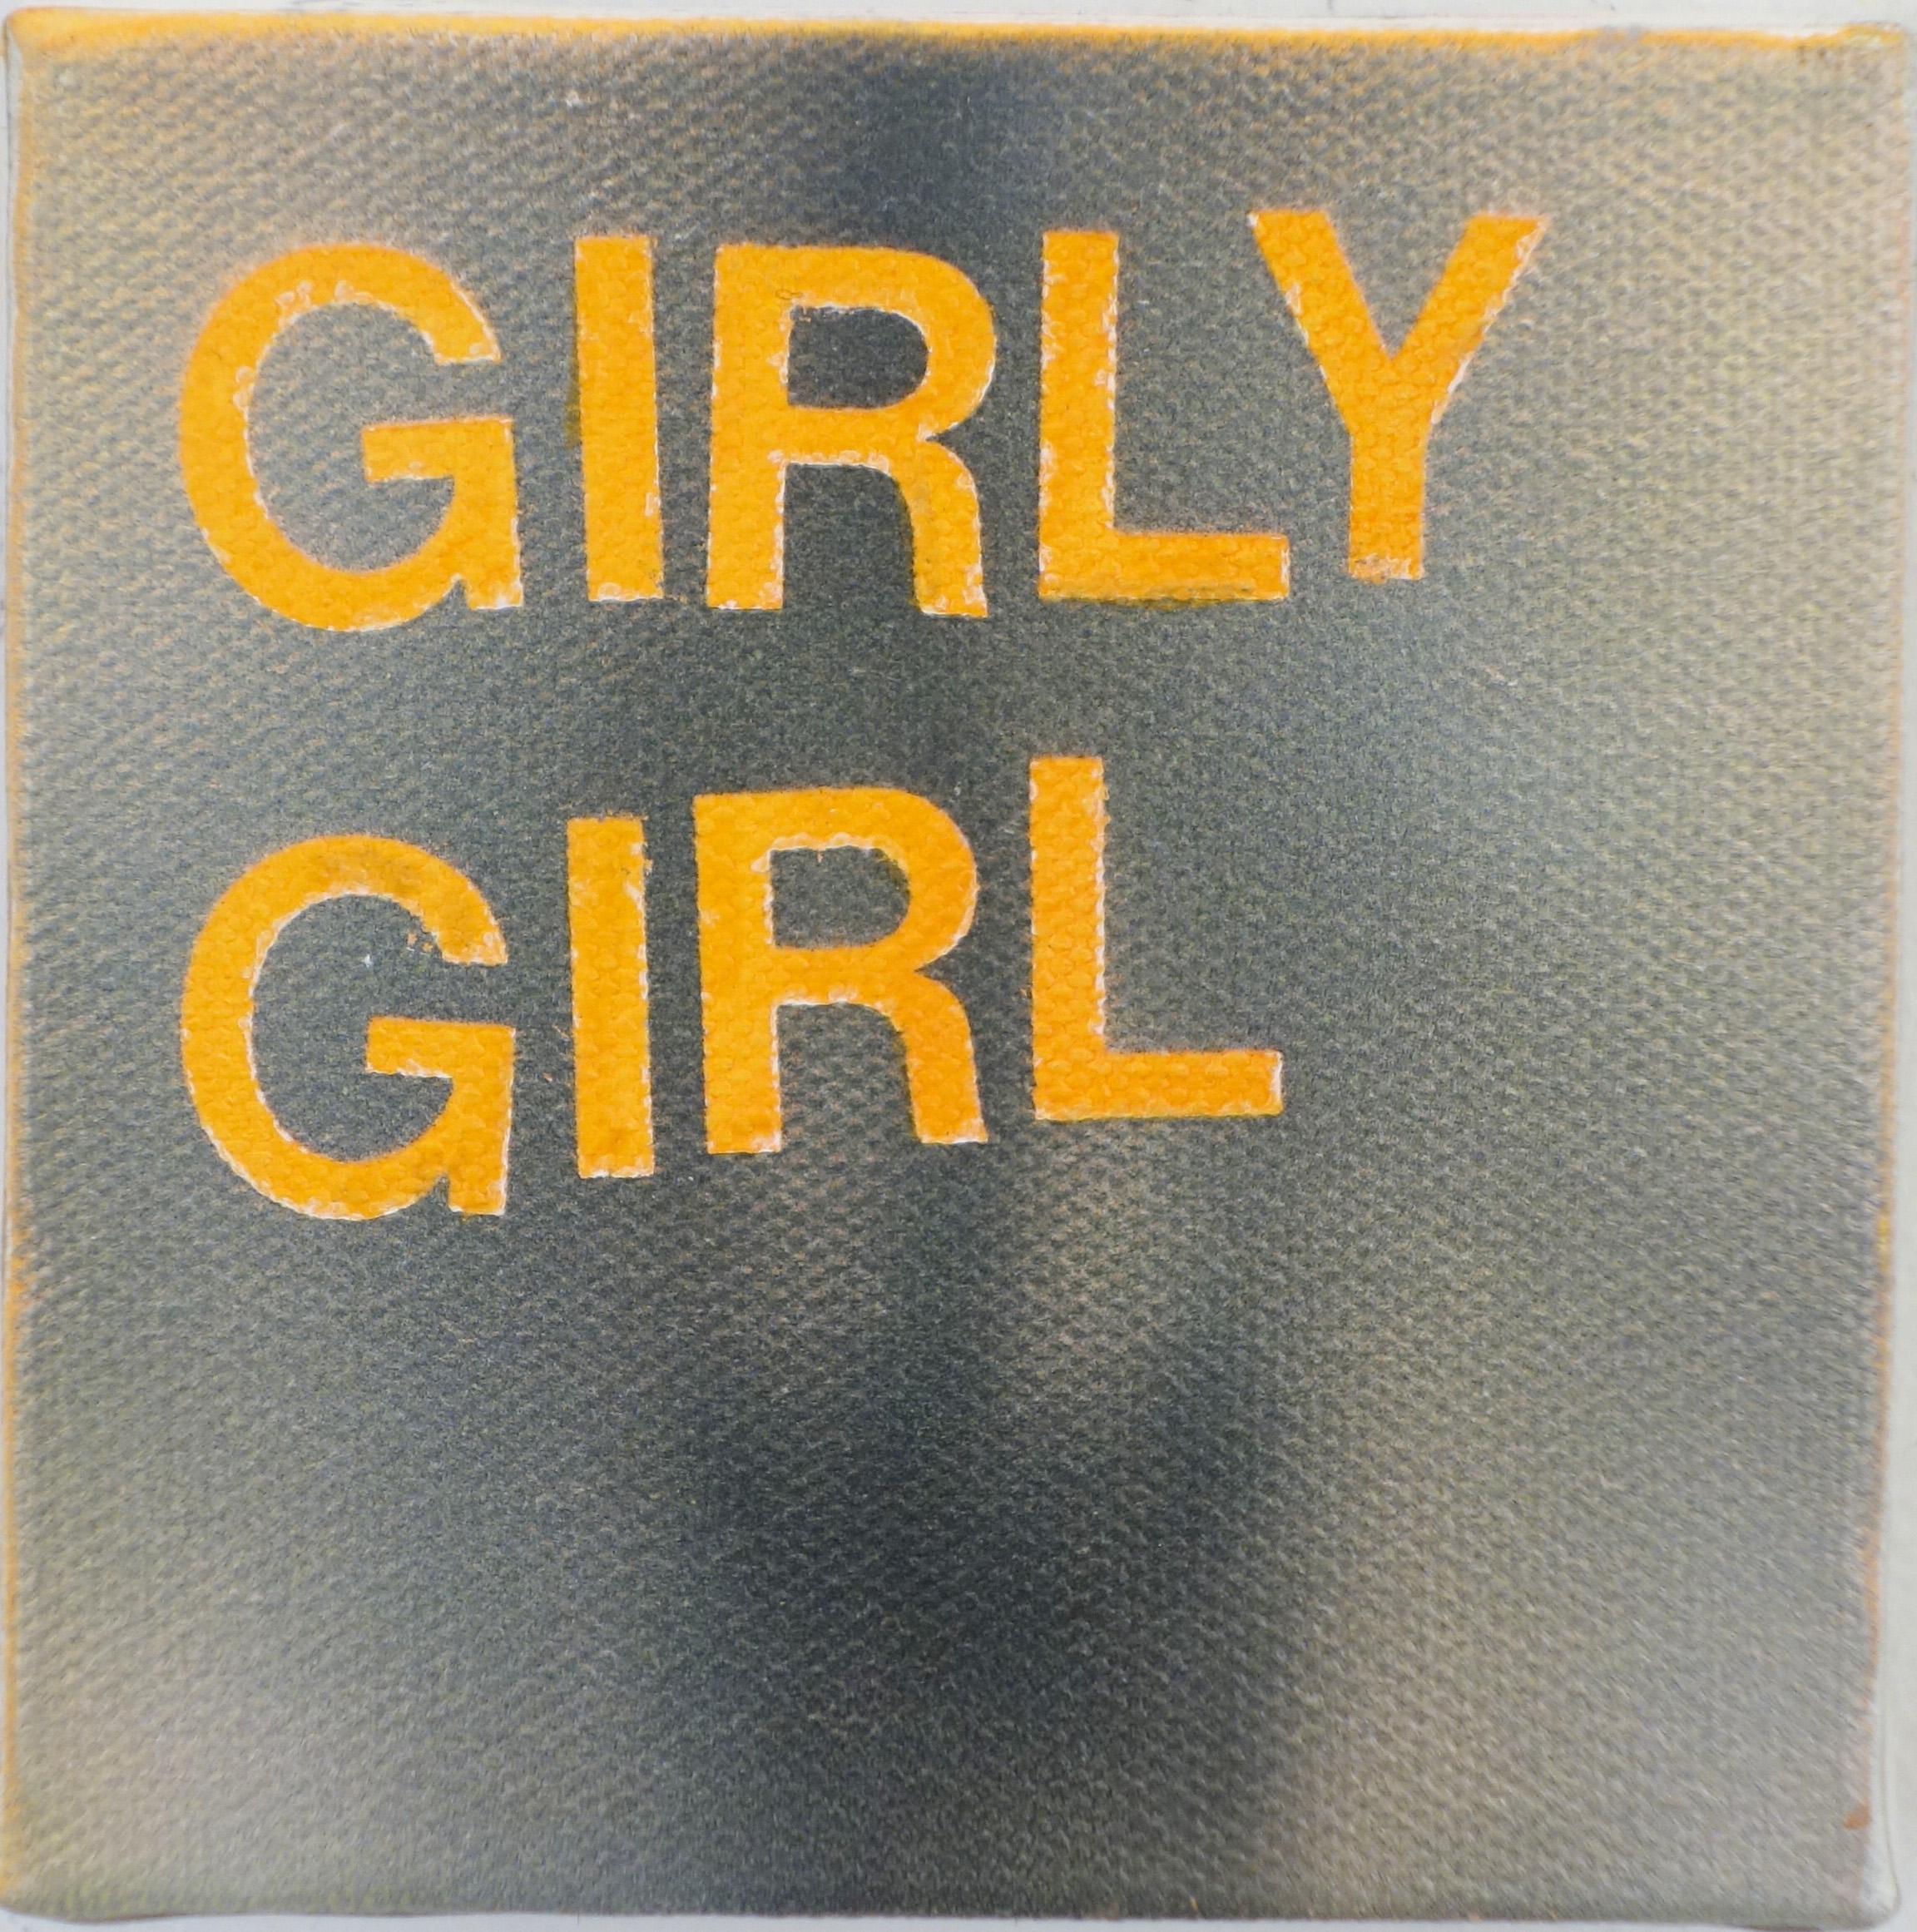 girly girl 4x4%22 2013.jpg